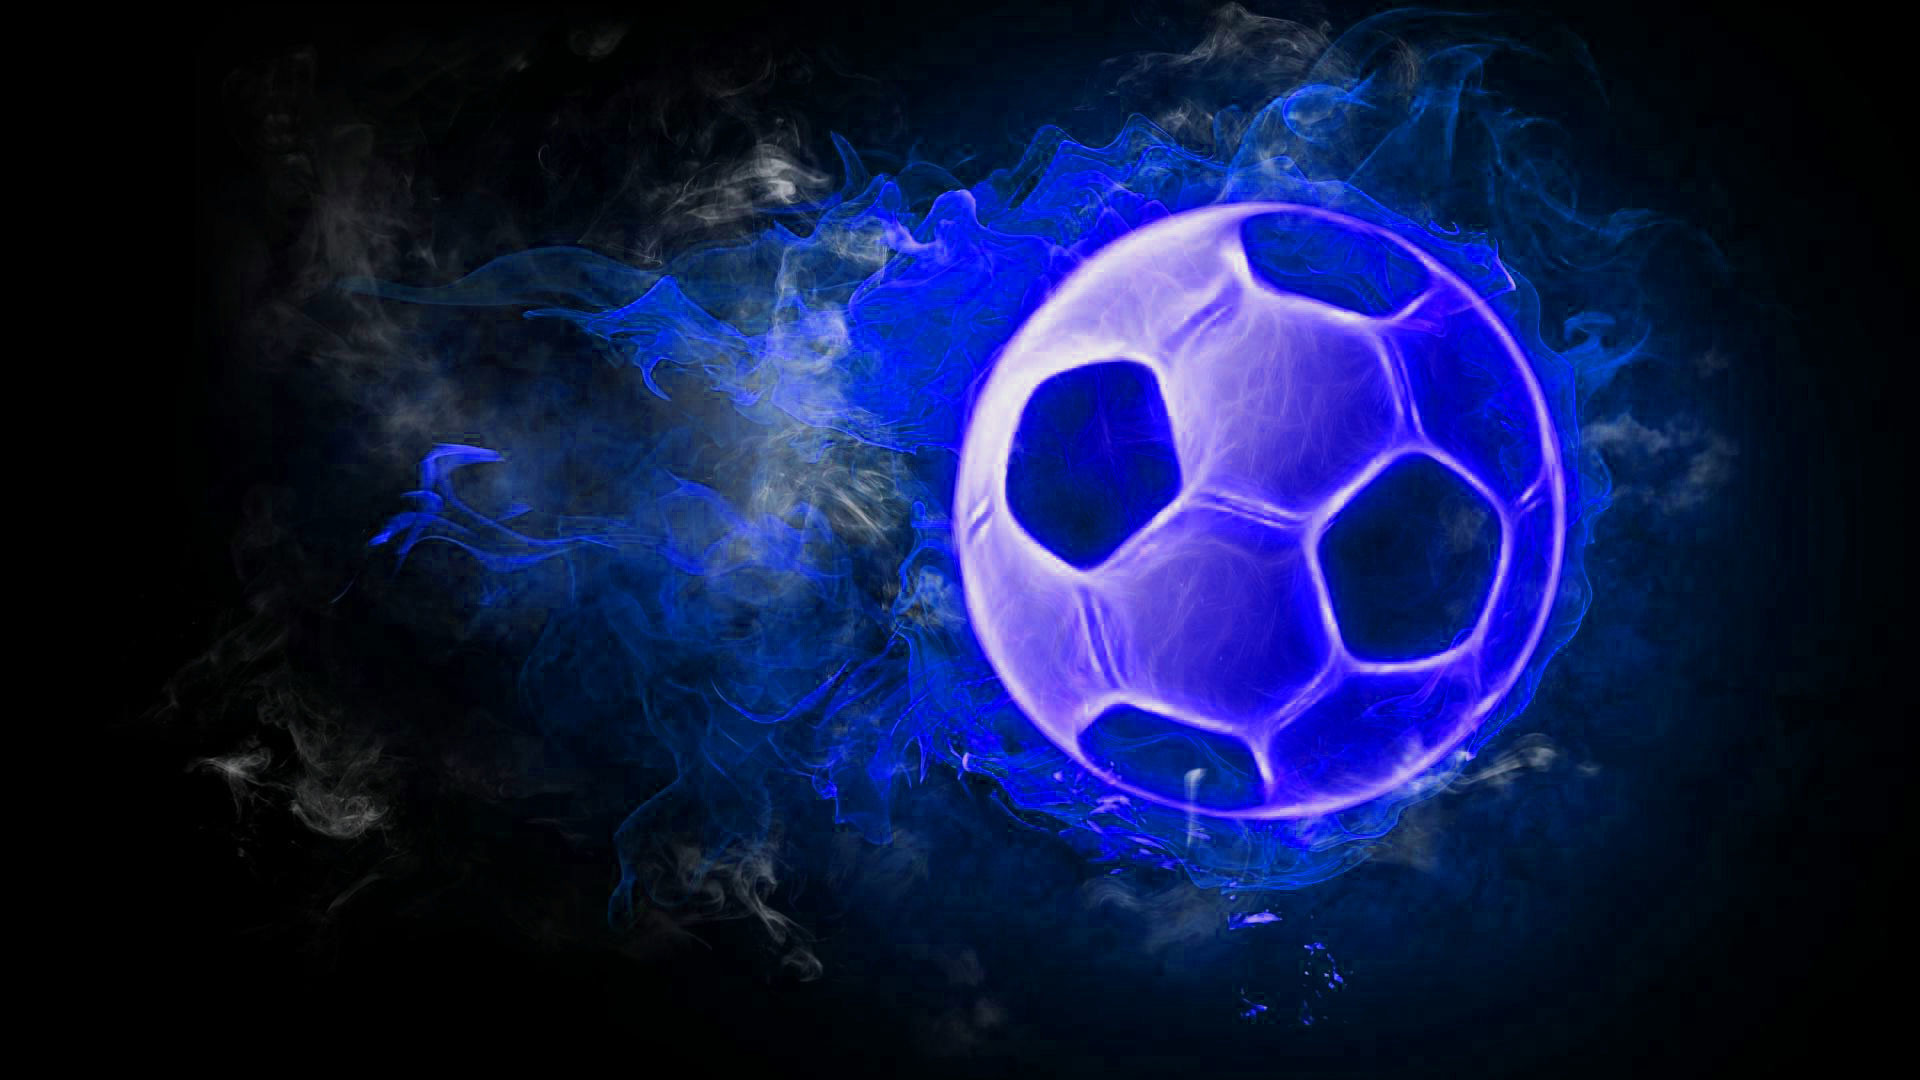 hd pics photos football in fire